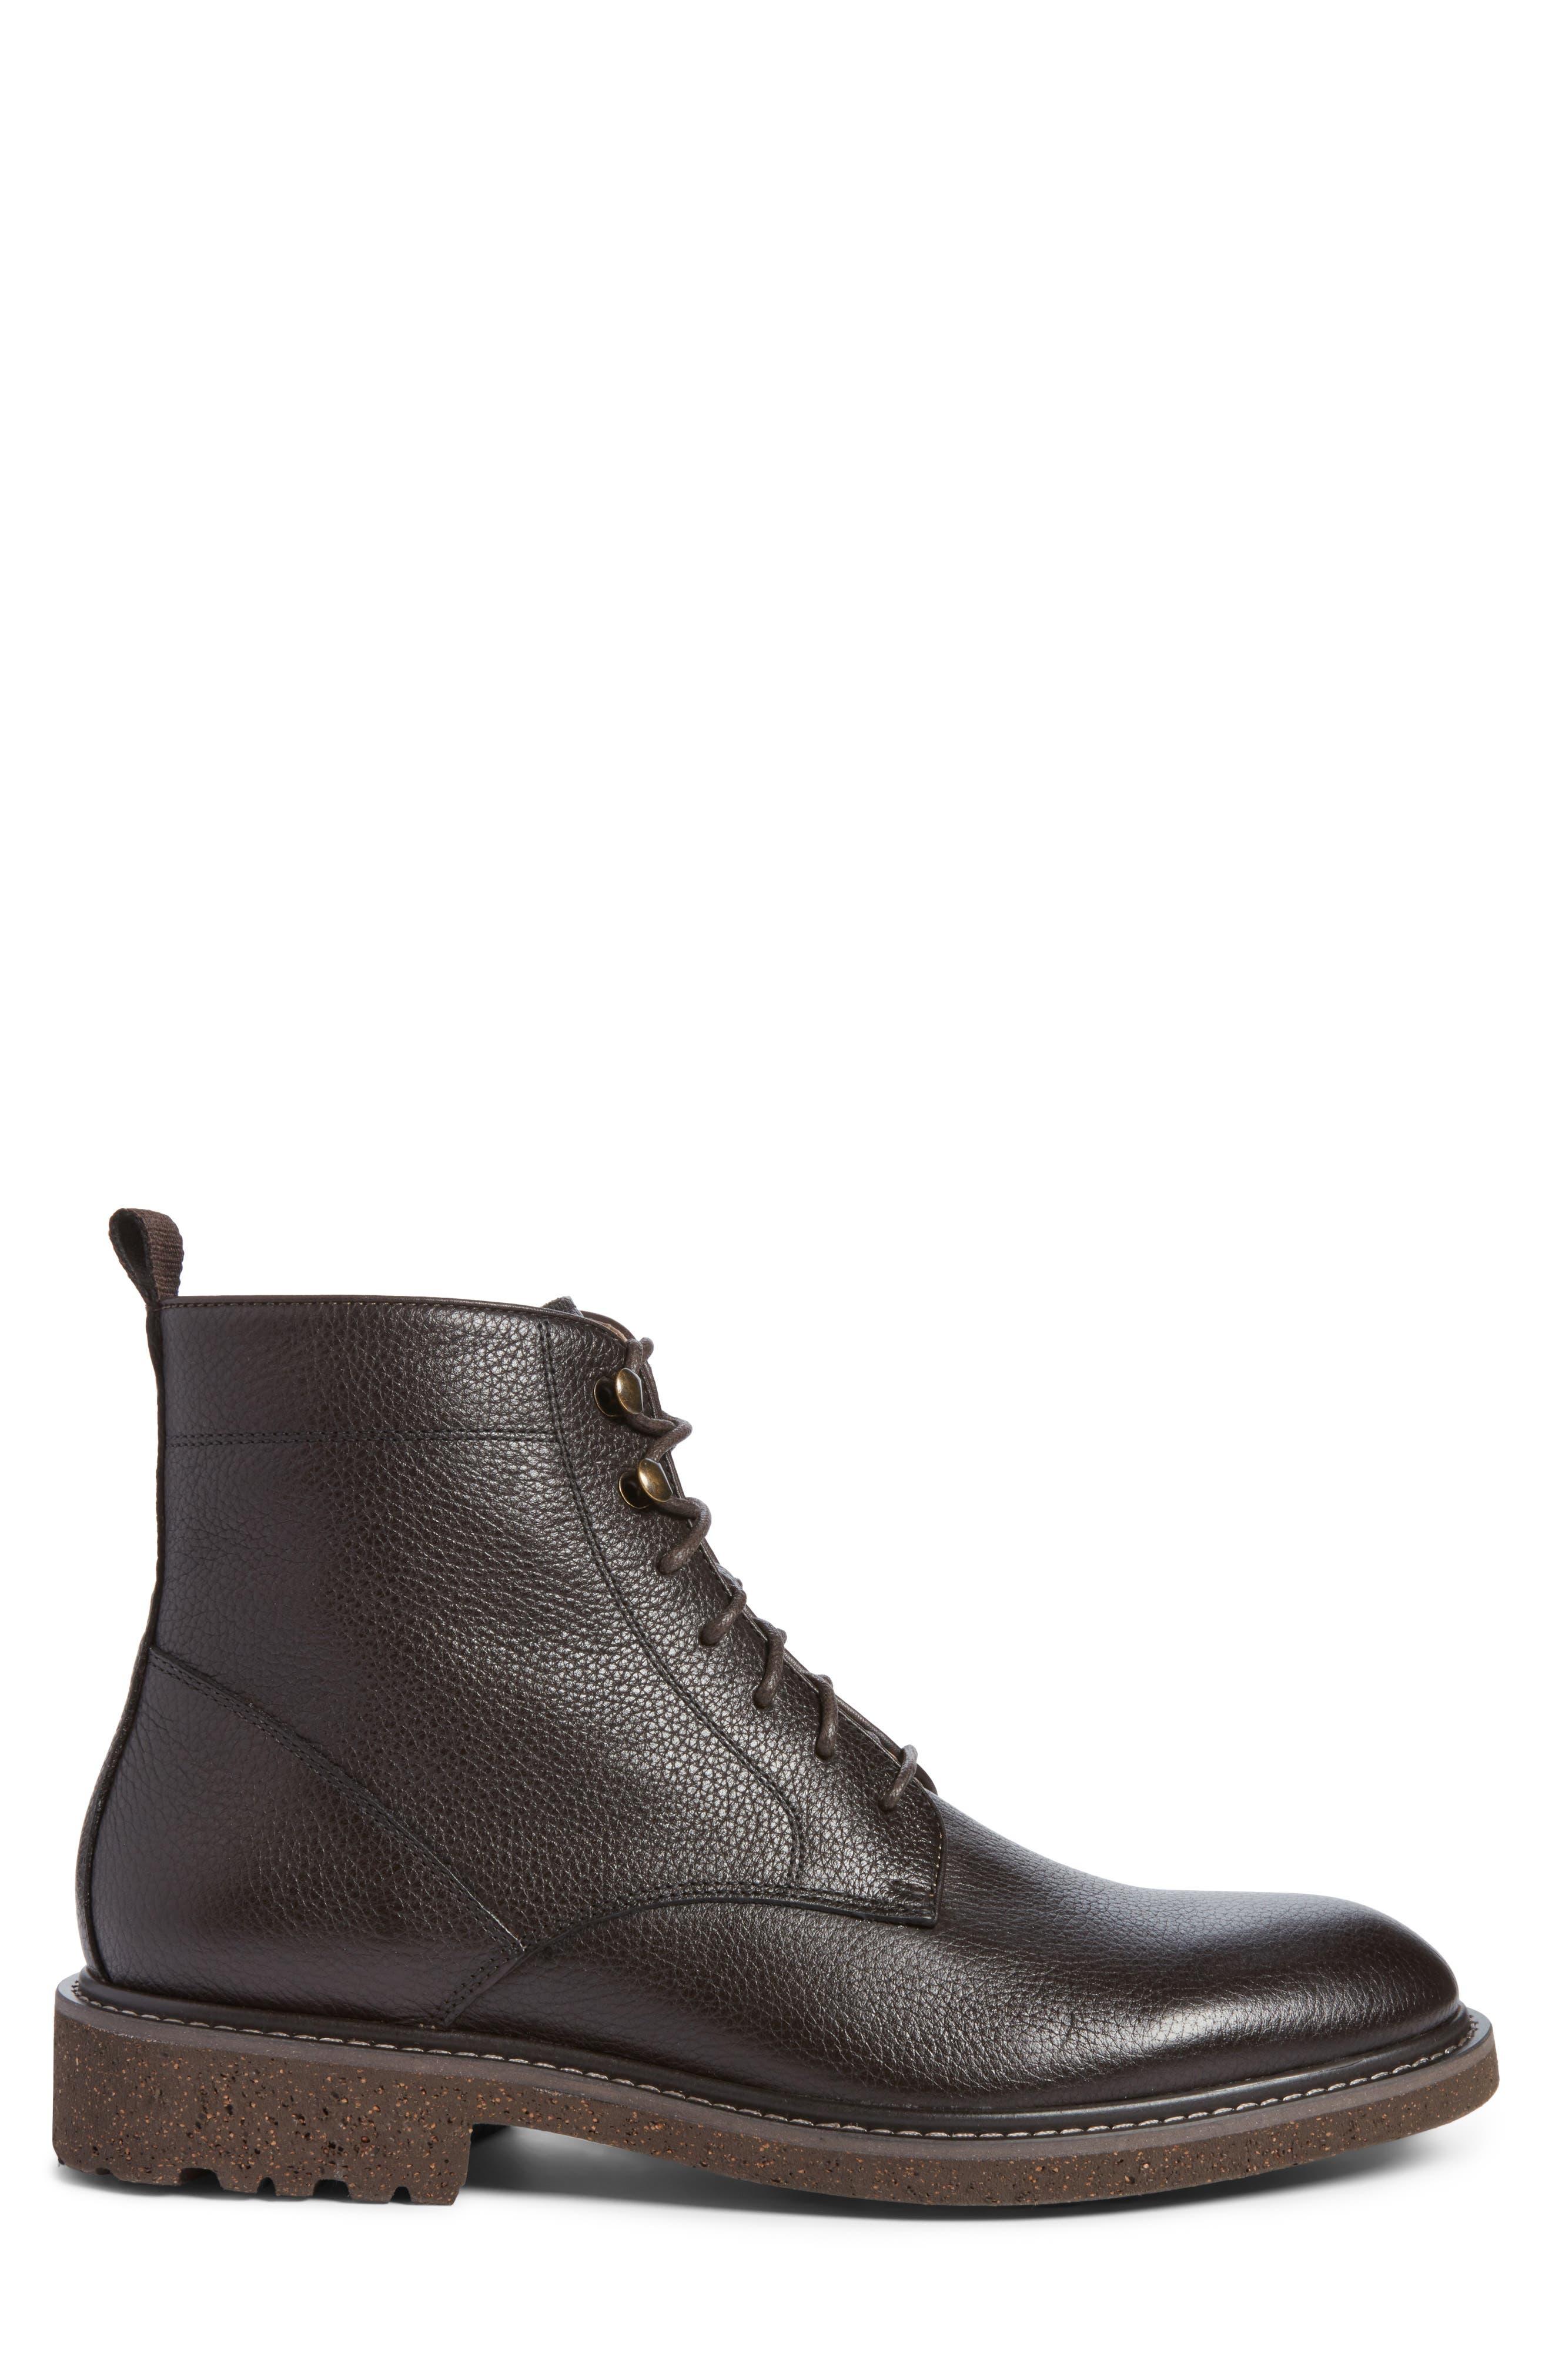 Trenton Plain Toe Boot,                             Alternate thumbnail 4, color,                             Chocolate Leather